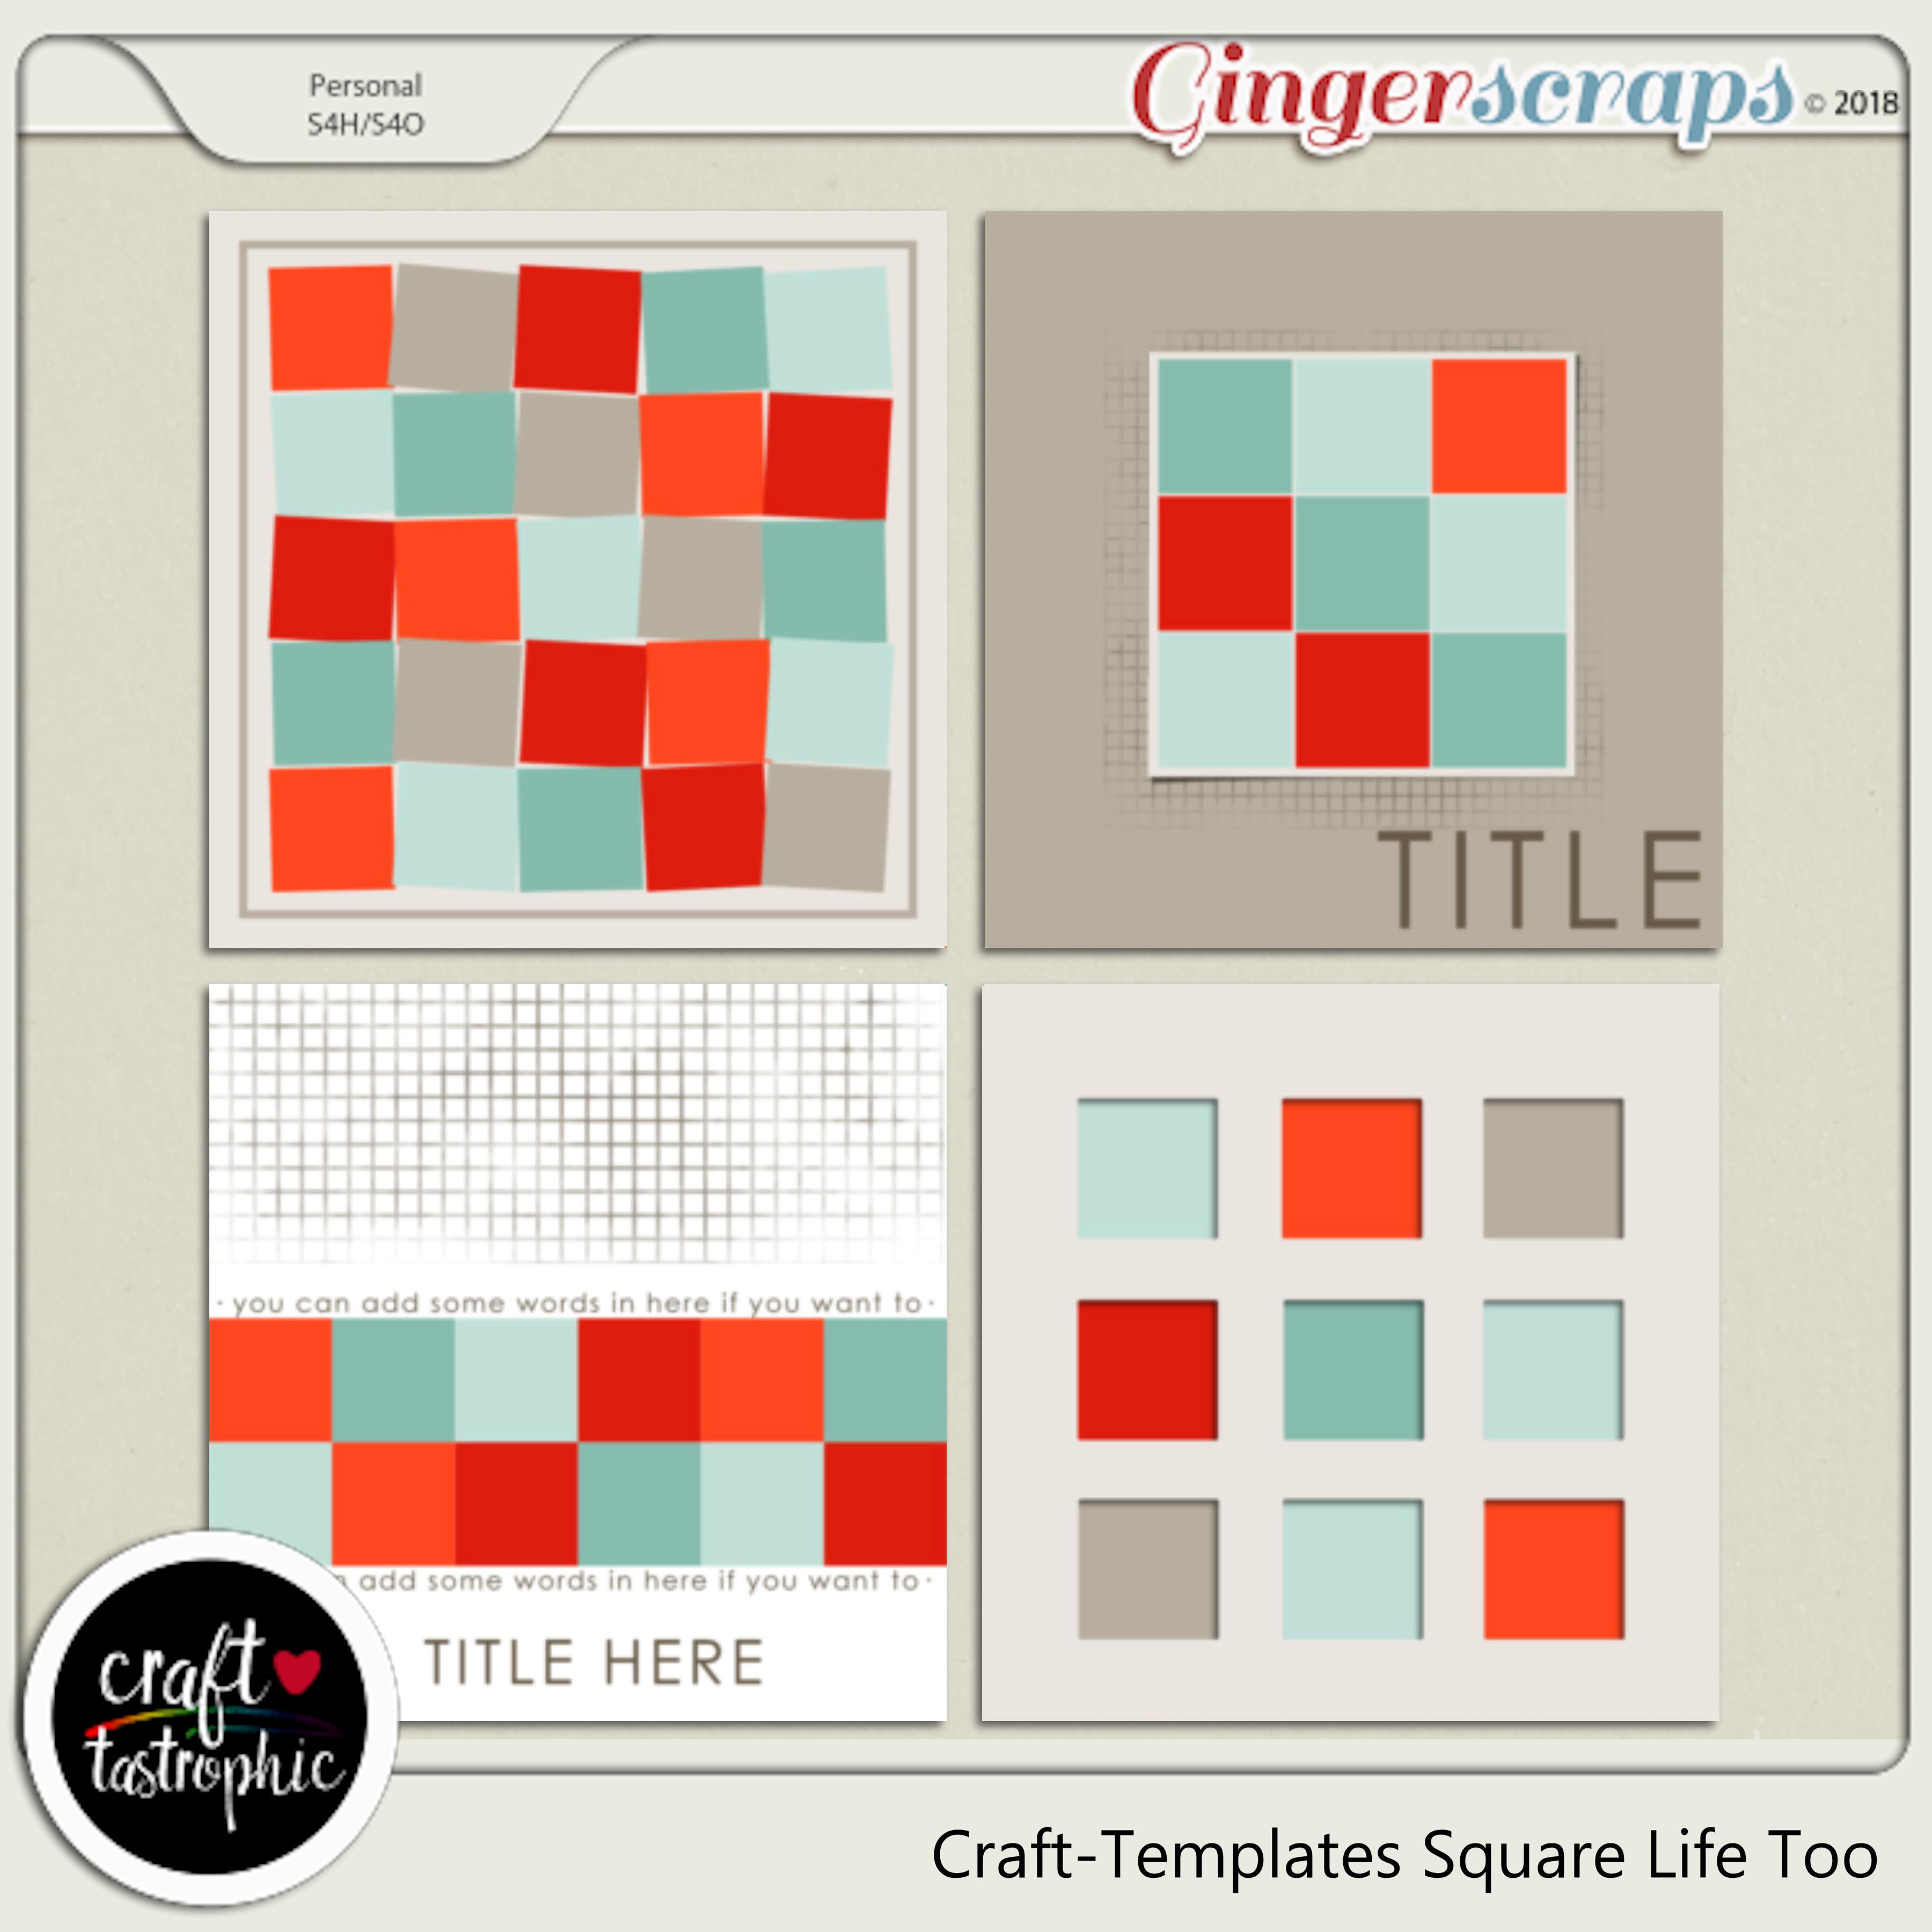 Craft-Templates Square Life Too